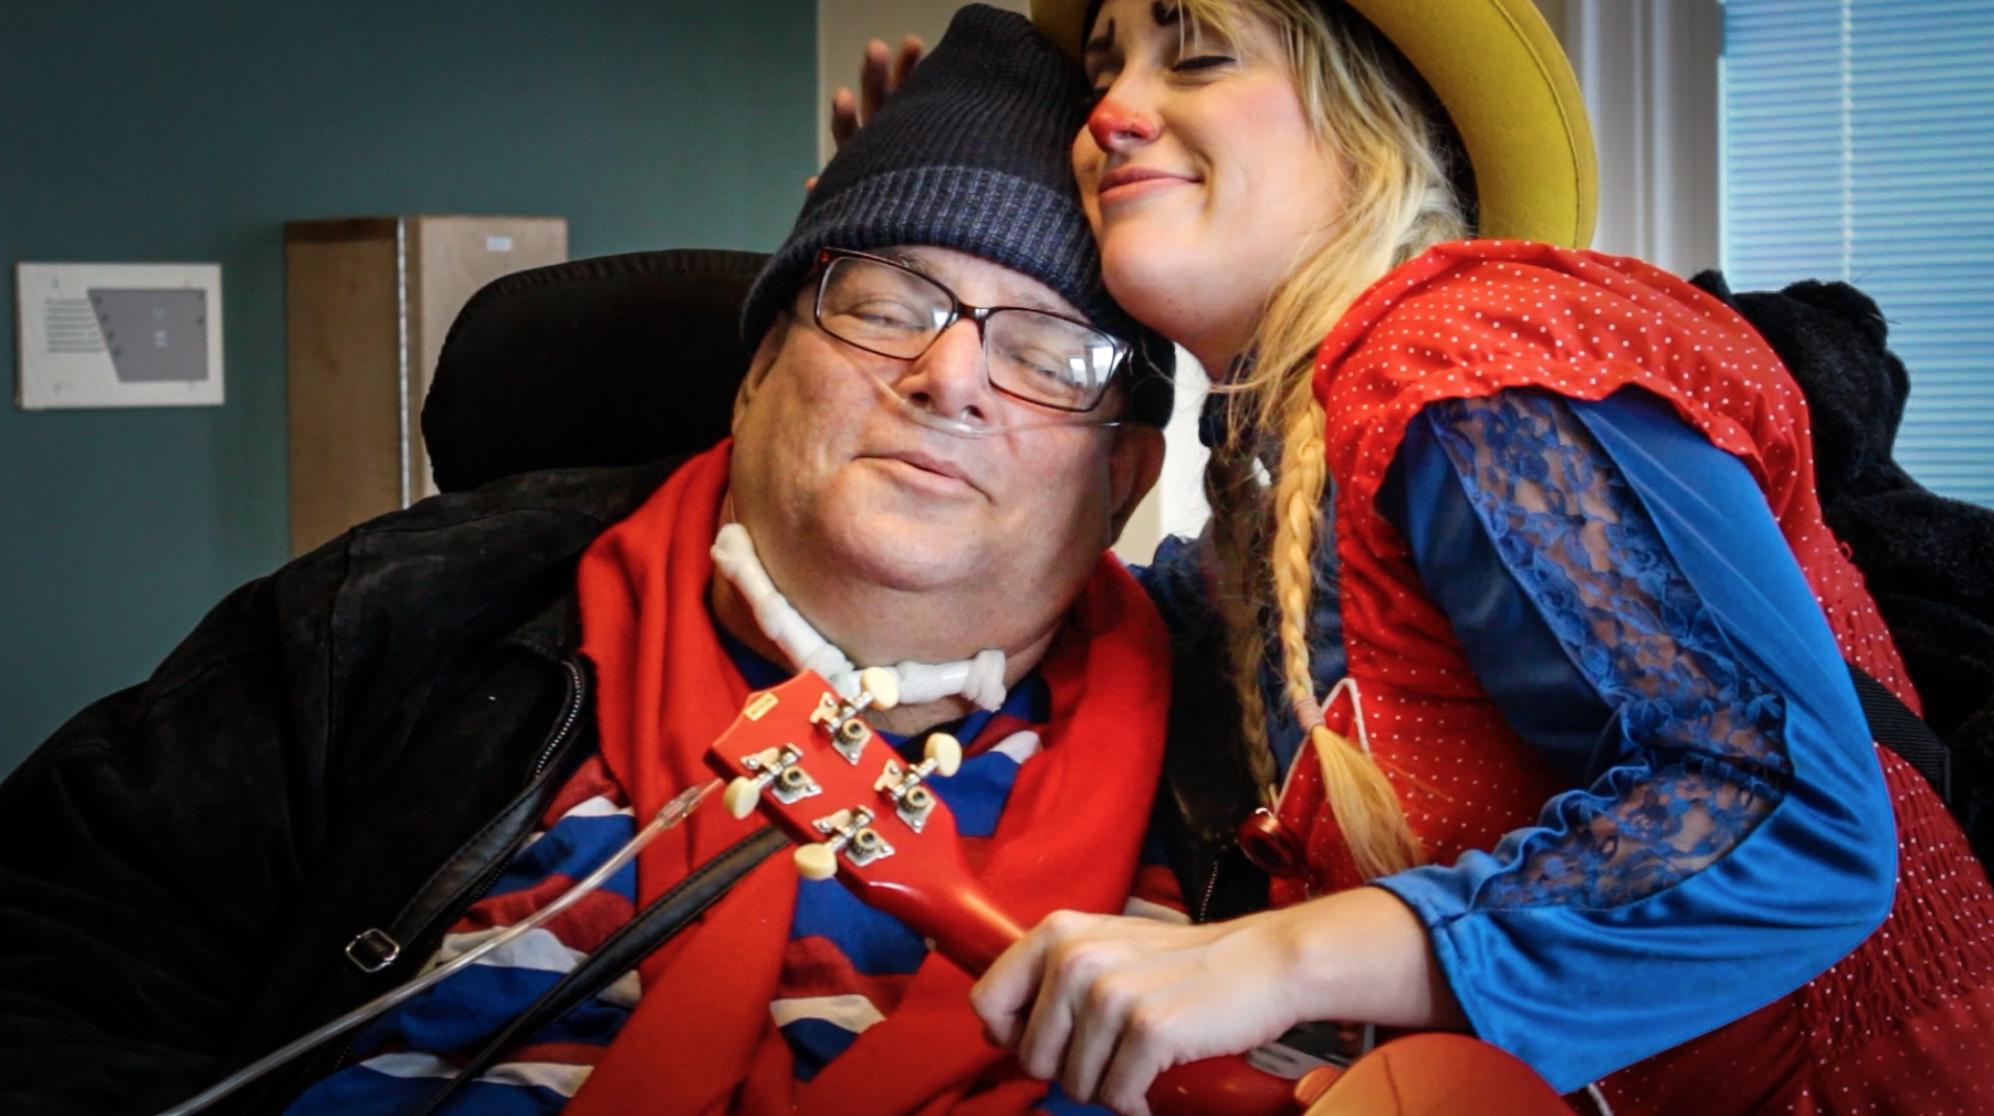 Image: Medical Clown hugging a patient